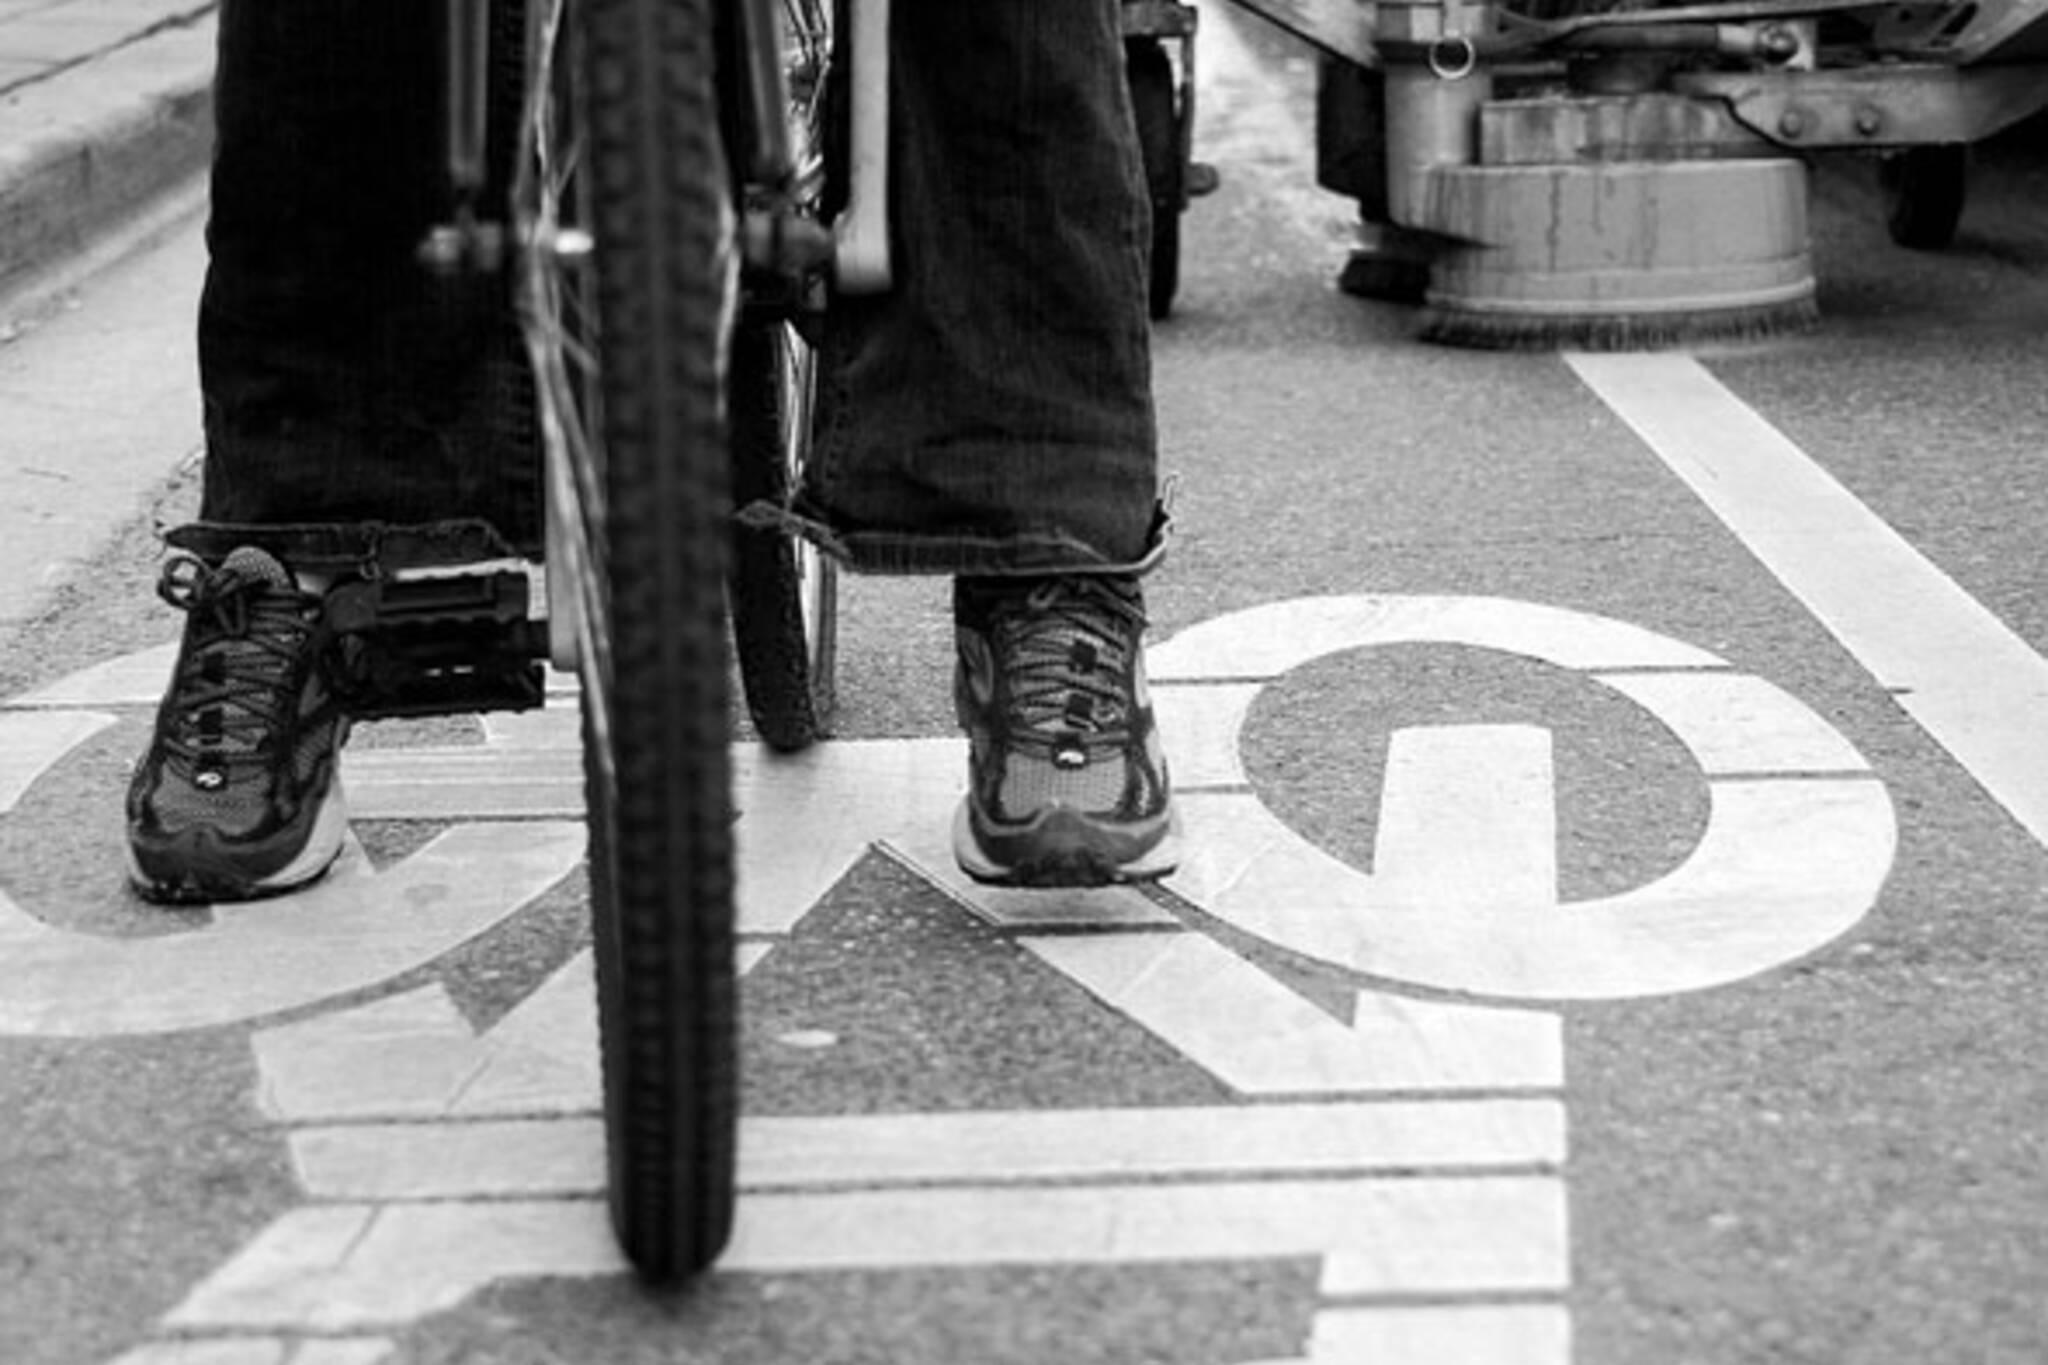 toronto jarvis bike lane